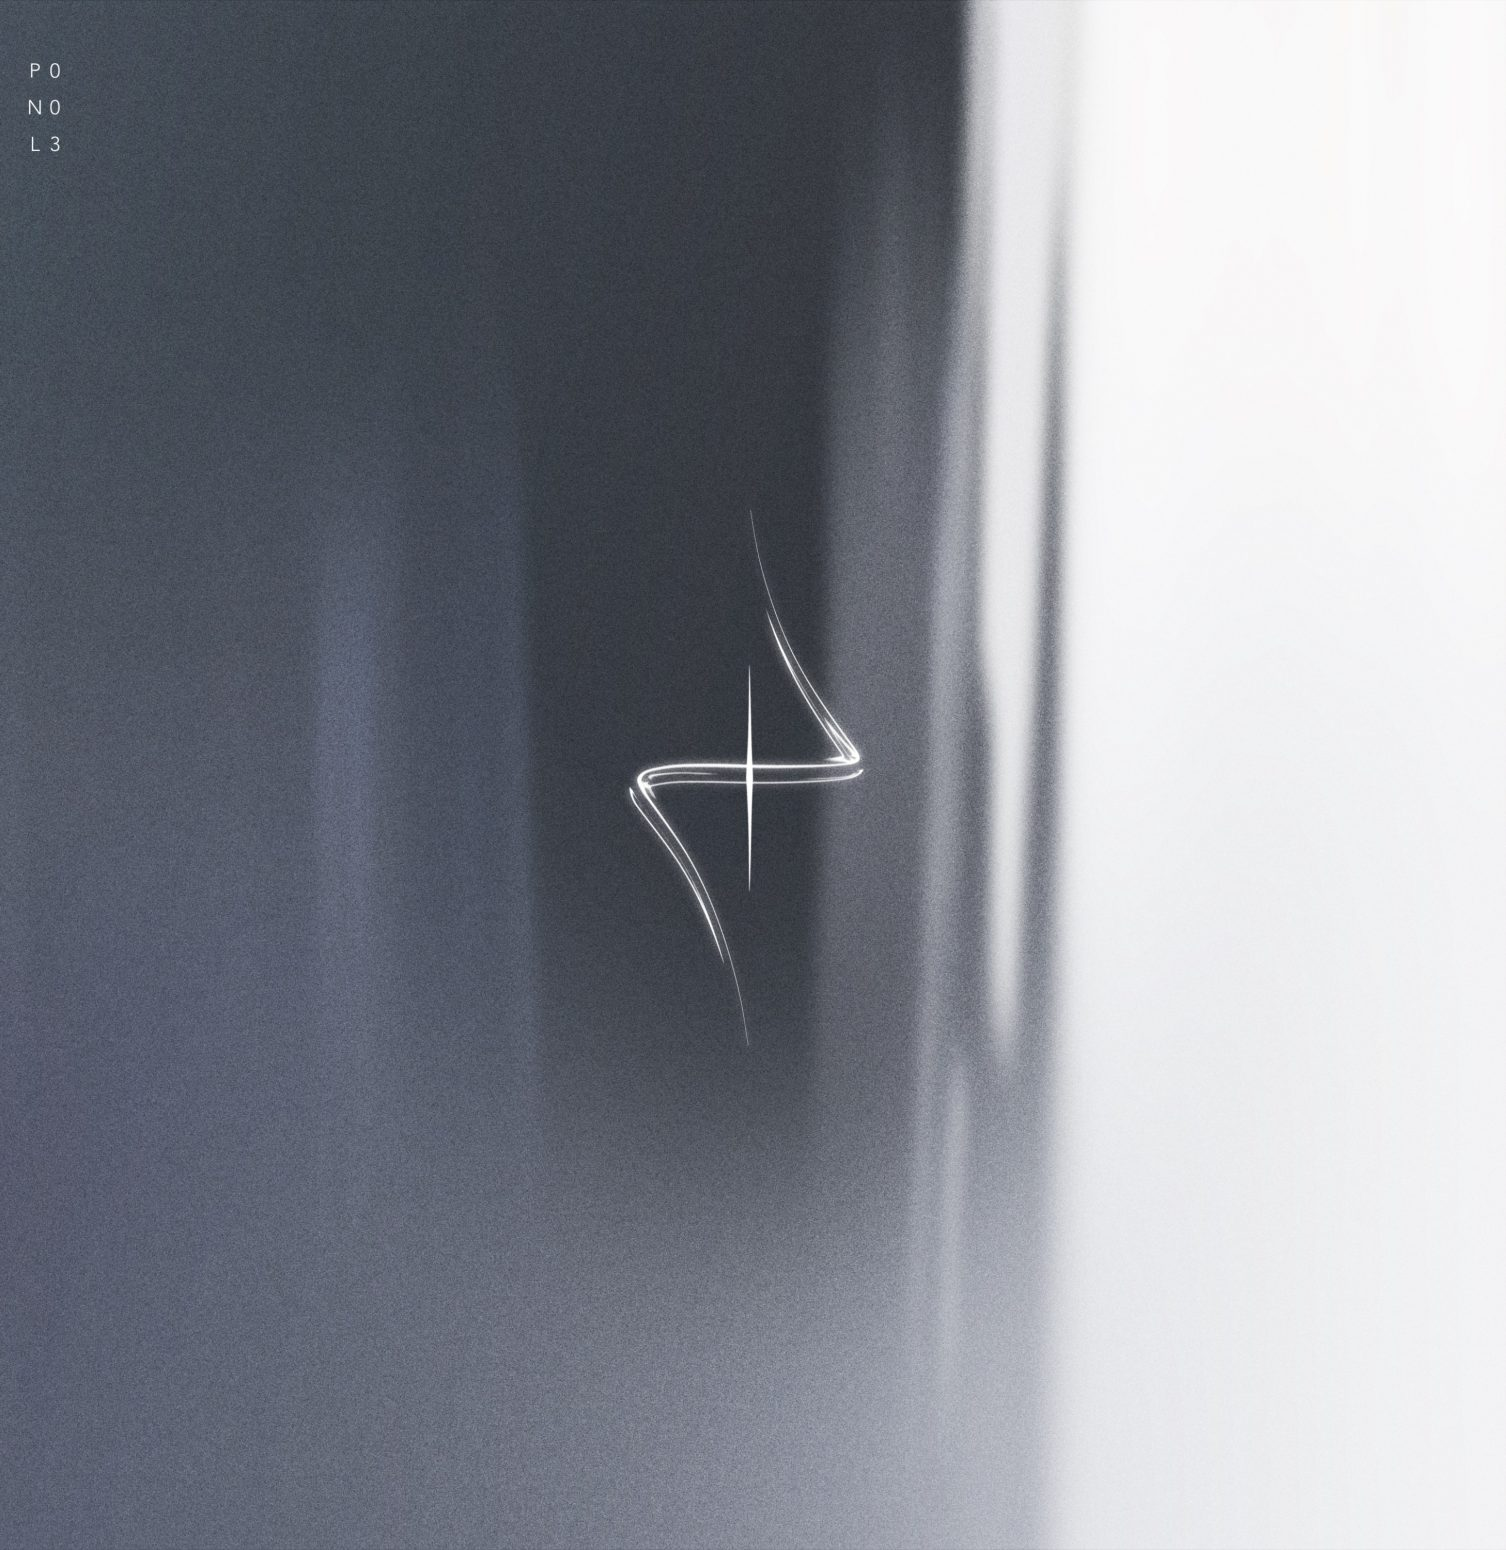 Phossa - Settle EP